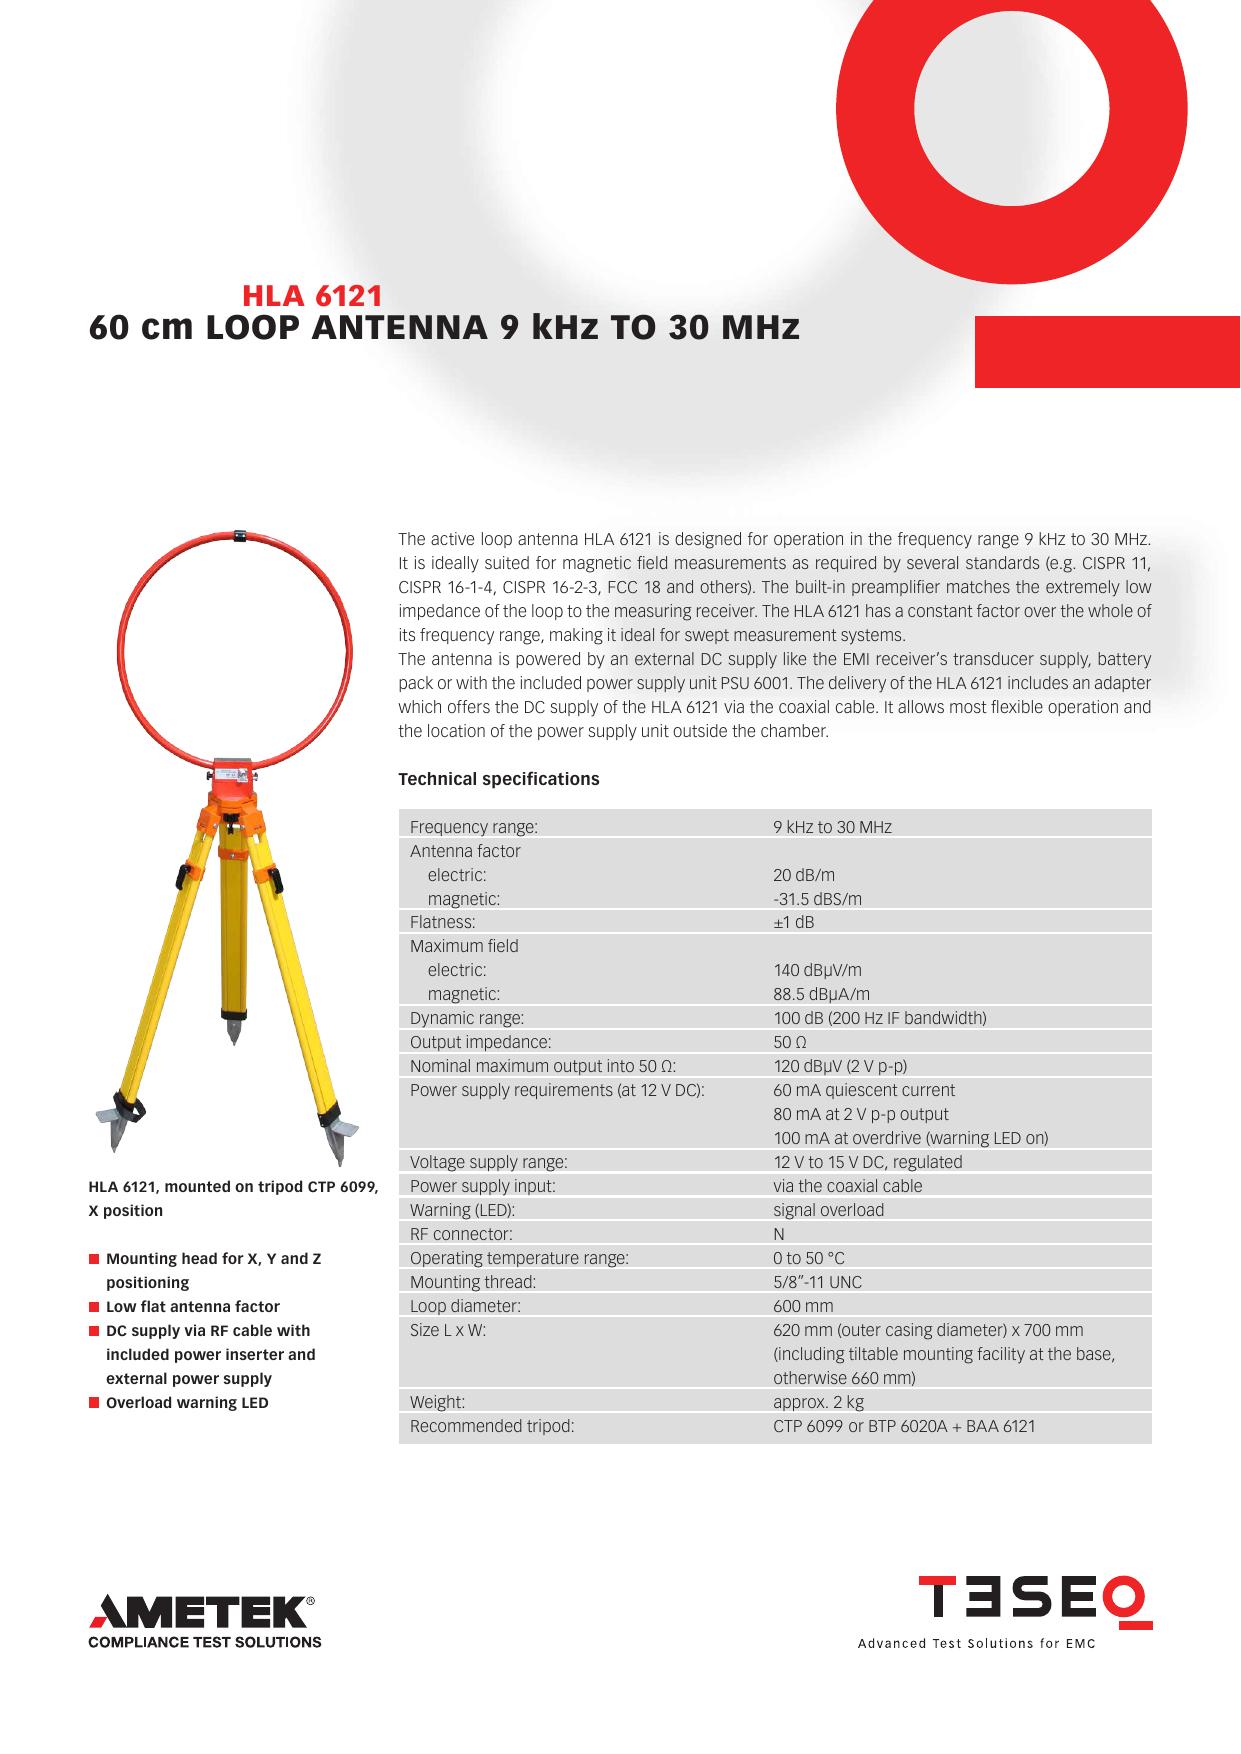 60 cm LOOP ANTENNA 9 kHz TO 30 MHz | manualzz com